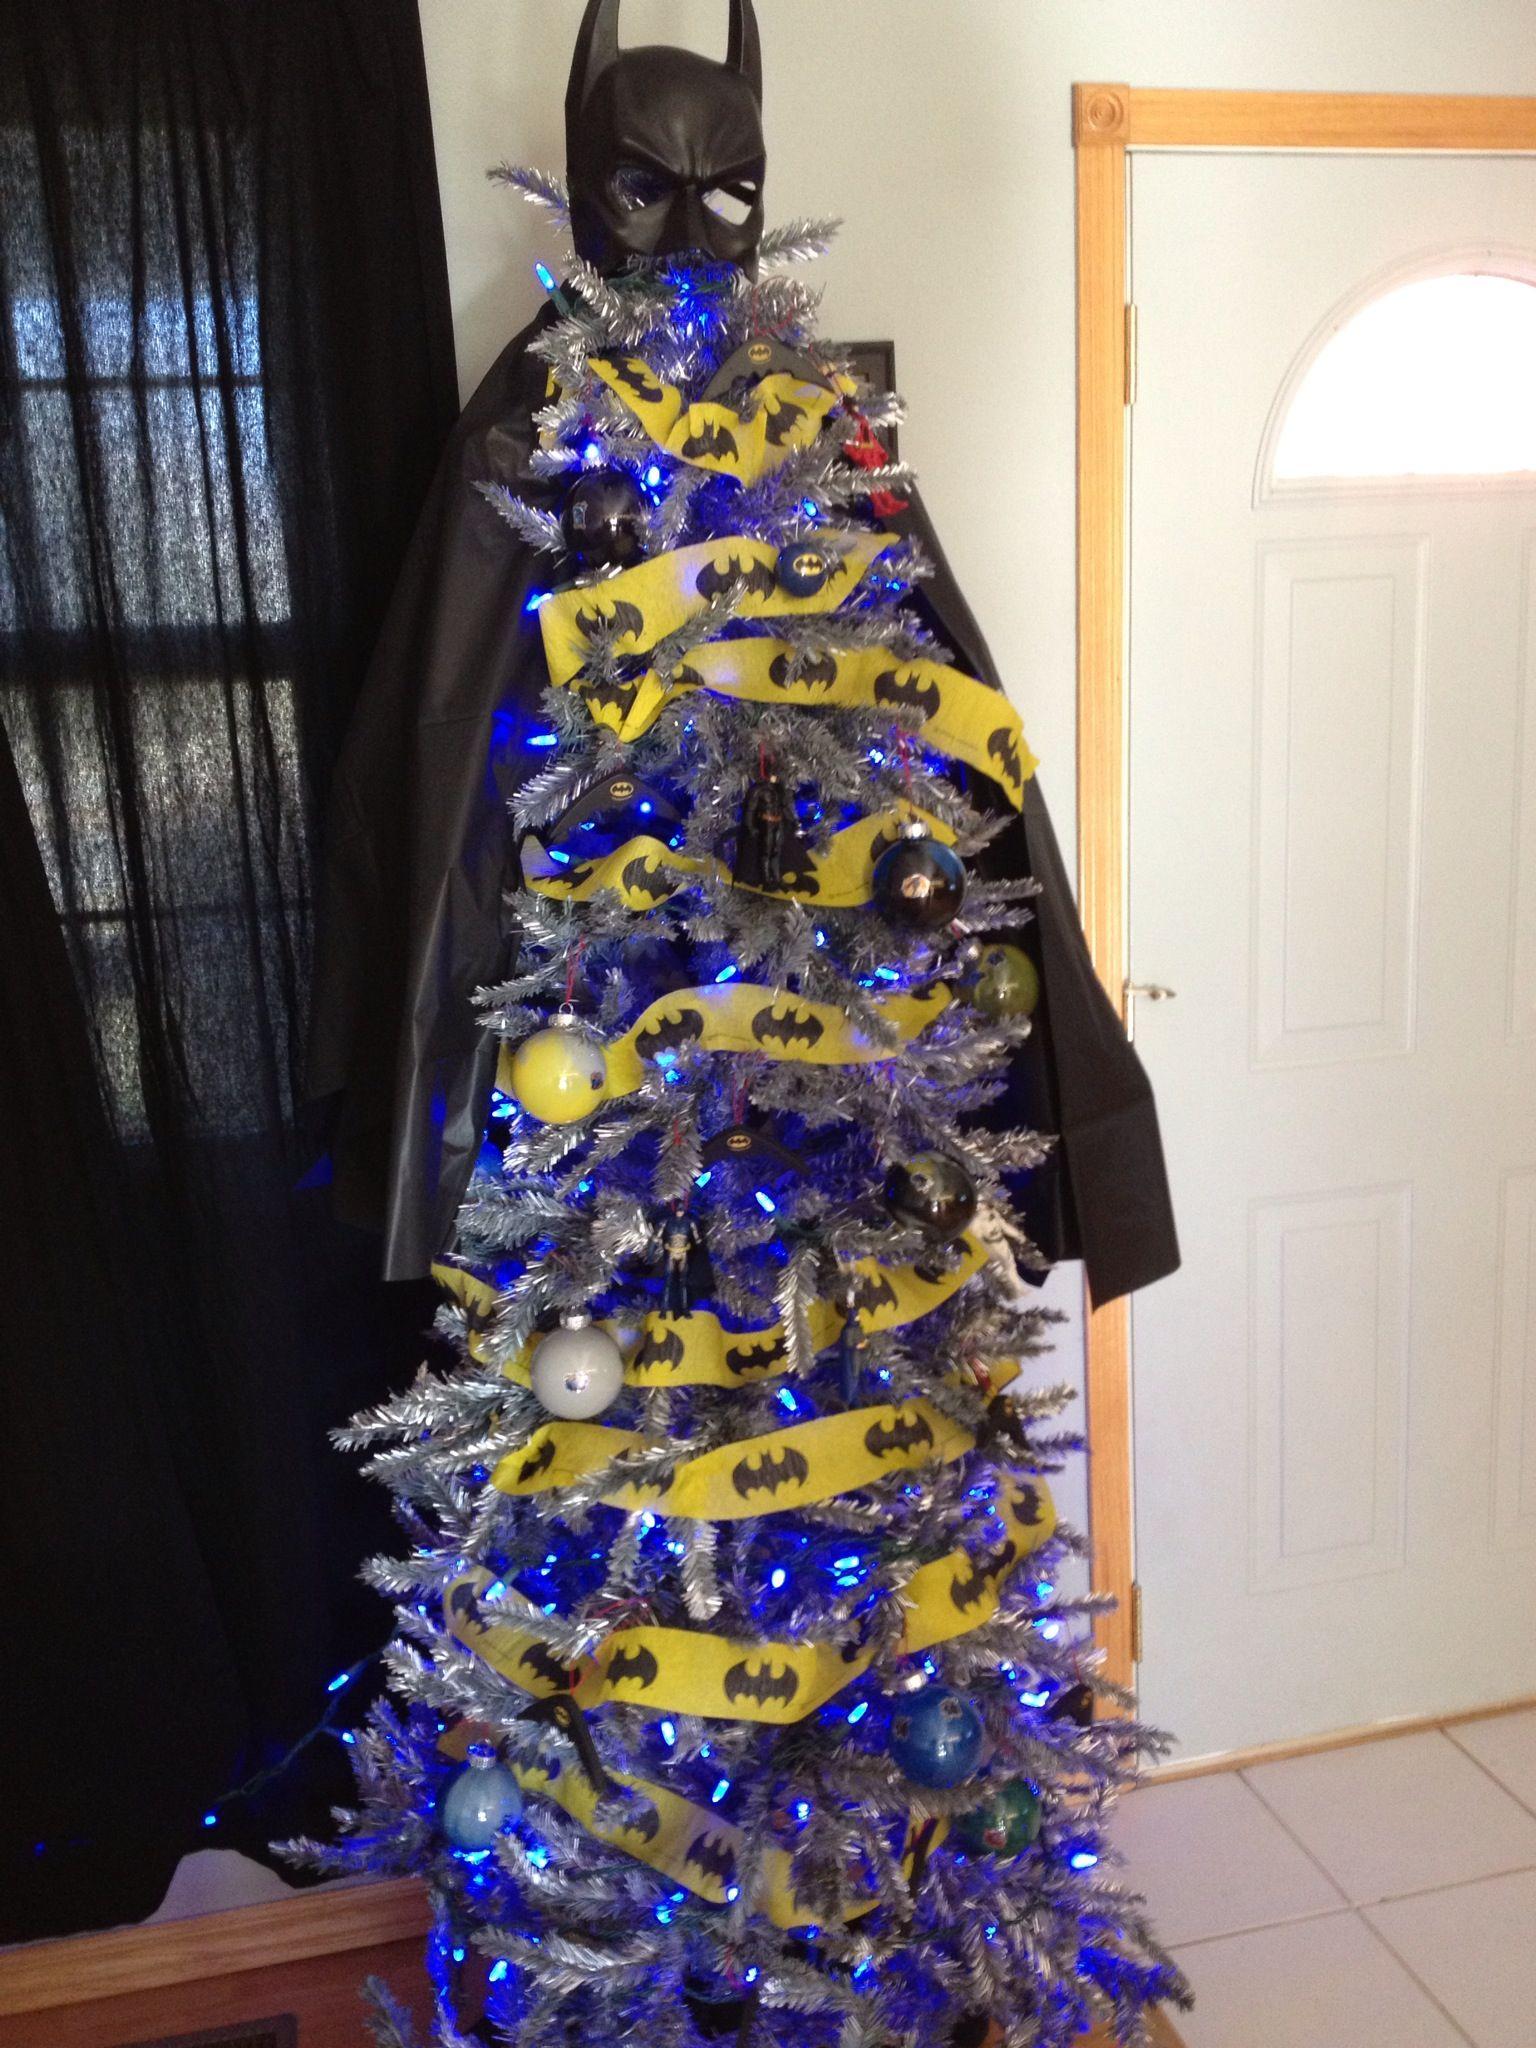 Christmas tree decorated like batman batman christmas tree batman how david whitfield wanted to